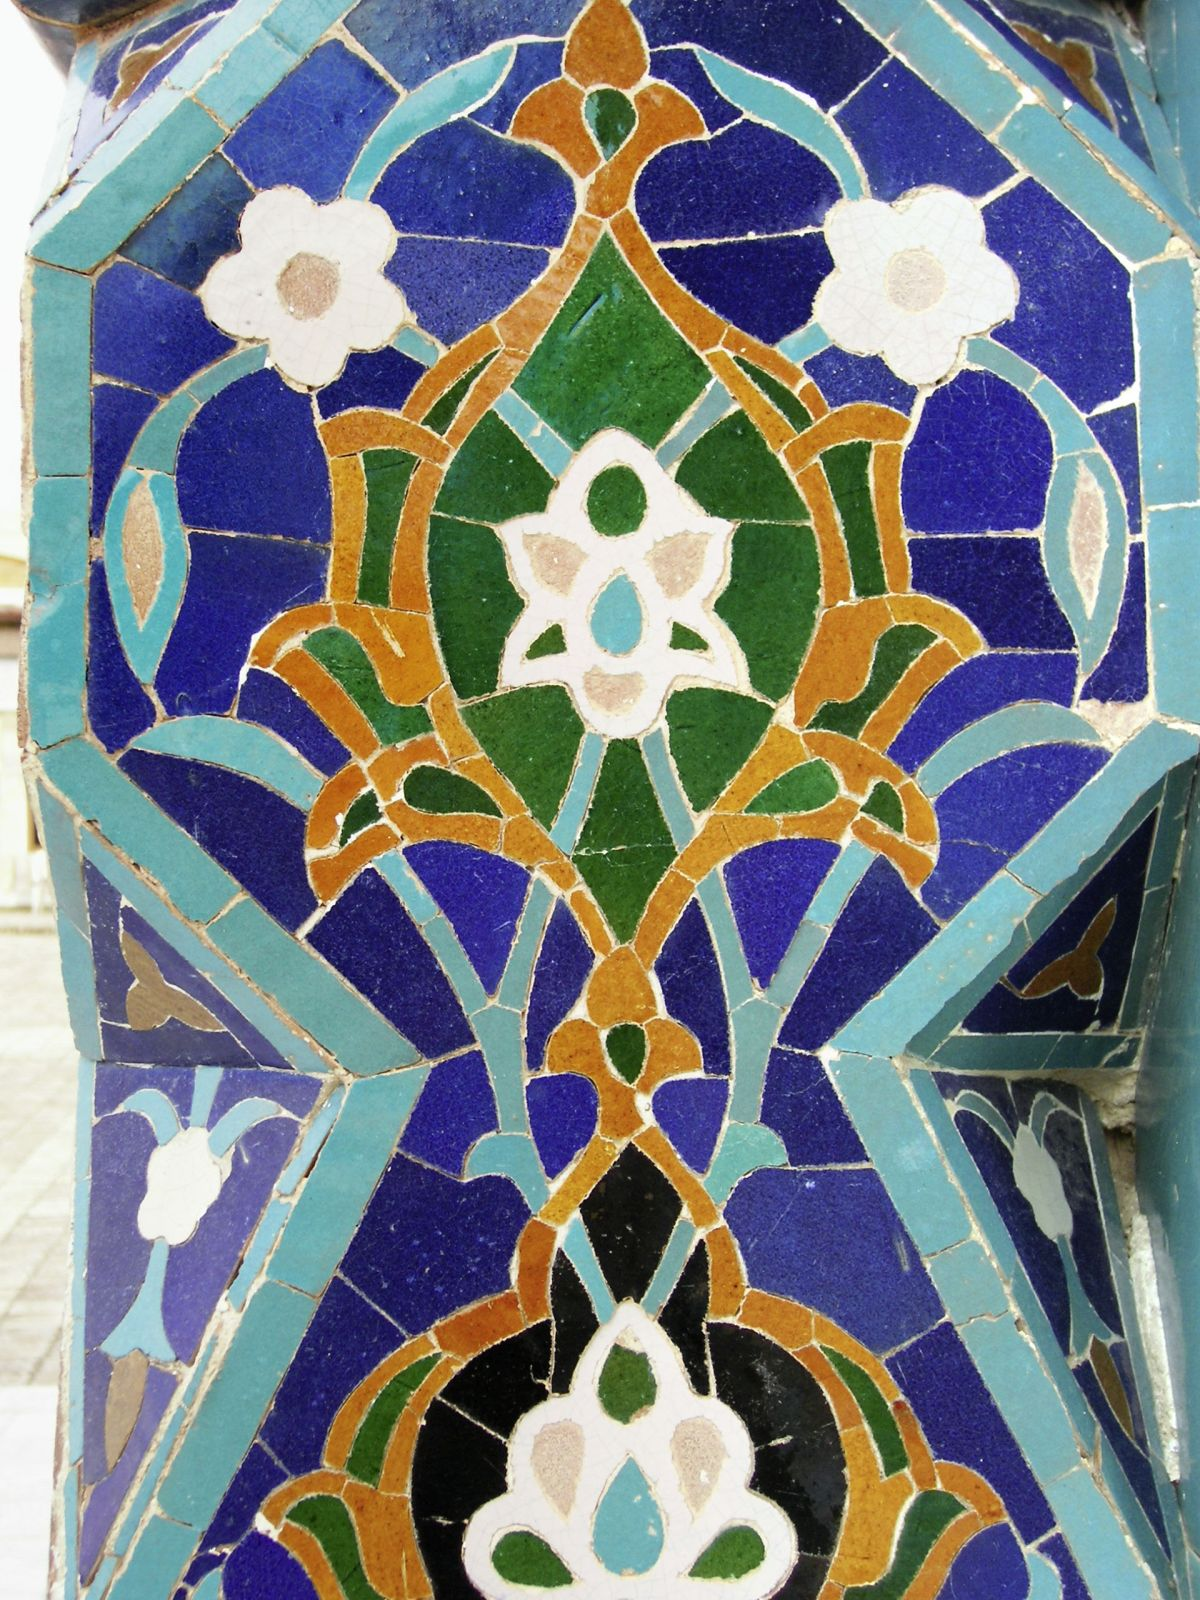 Usbekistan Typische Kacheln (c) Marco Polo Reisen